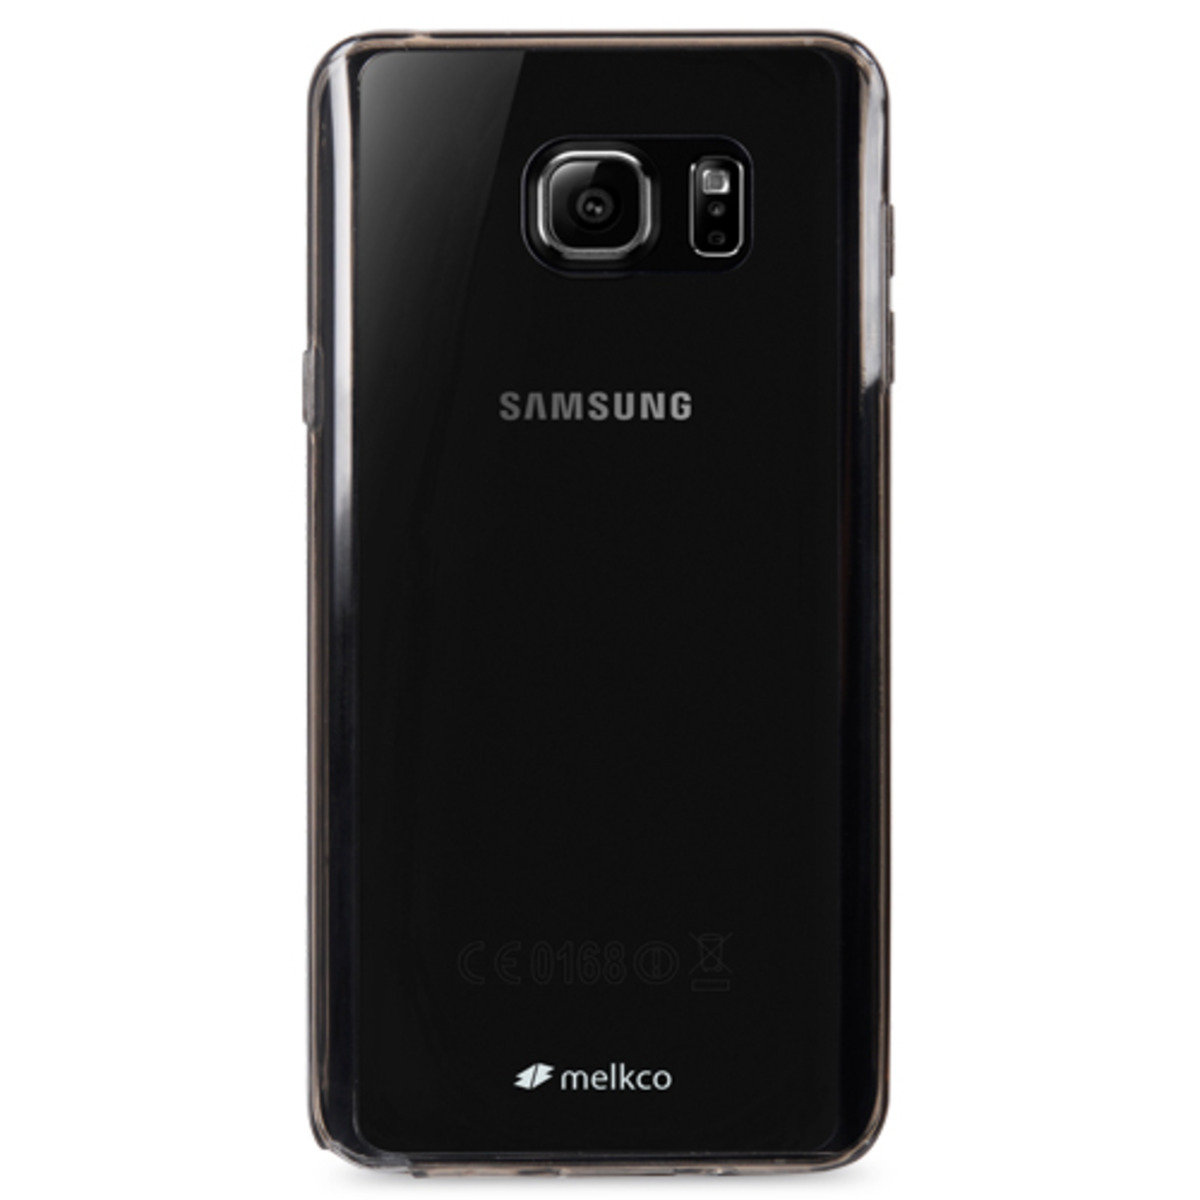 Galaxy Note 5 PolyUltima手機保護殼 - 透明黑色(附送屏幕保護貼)